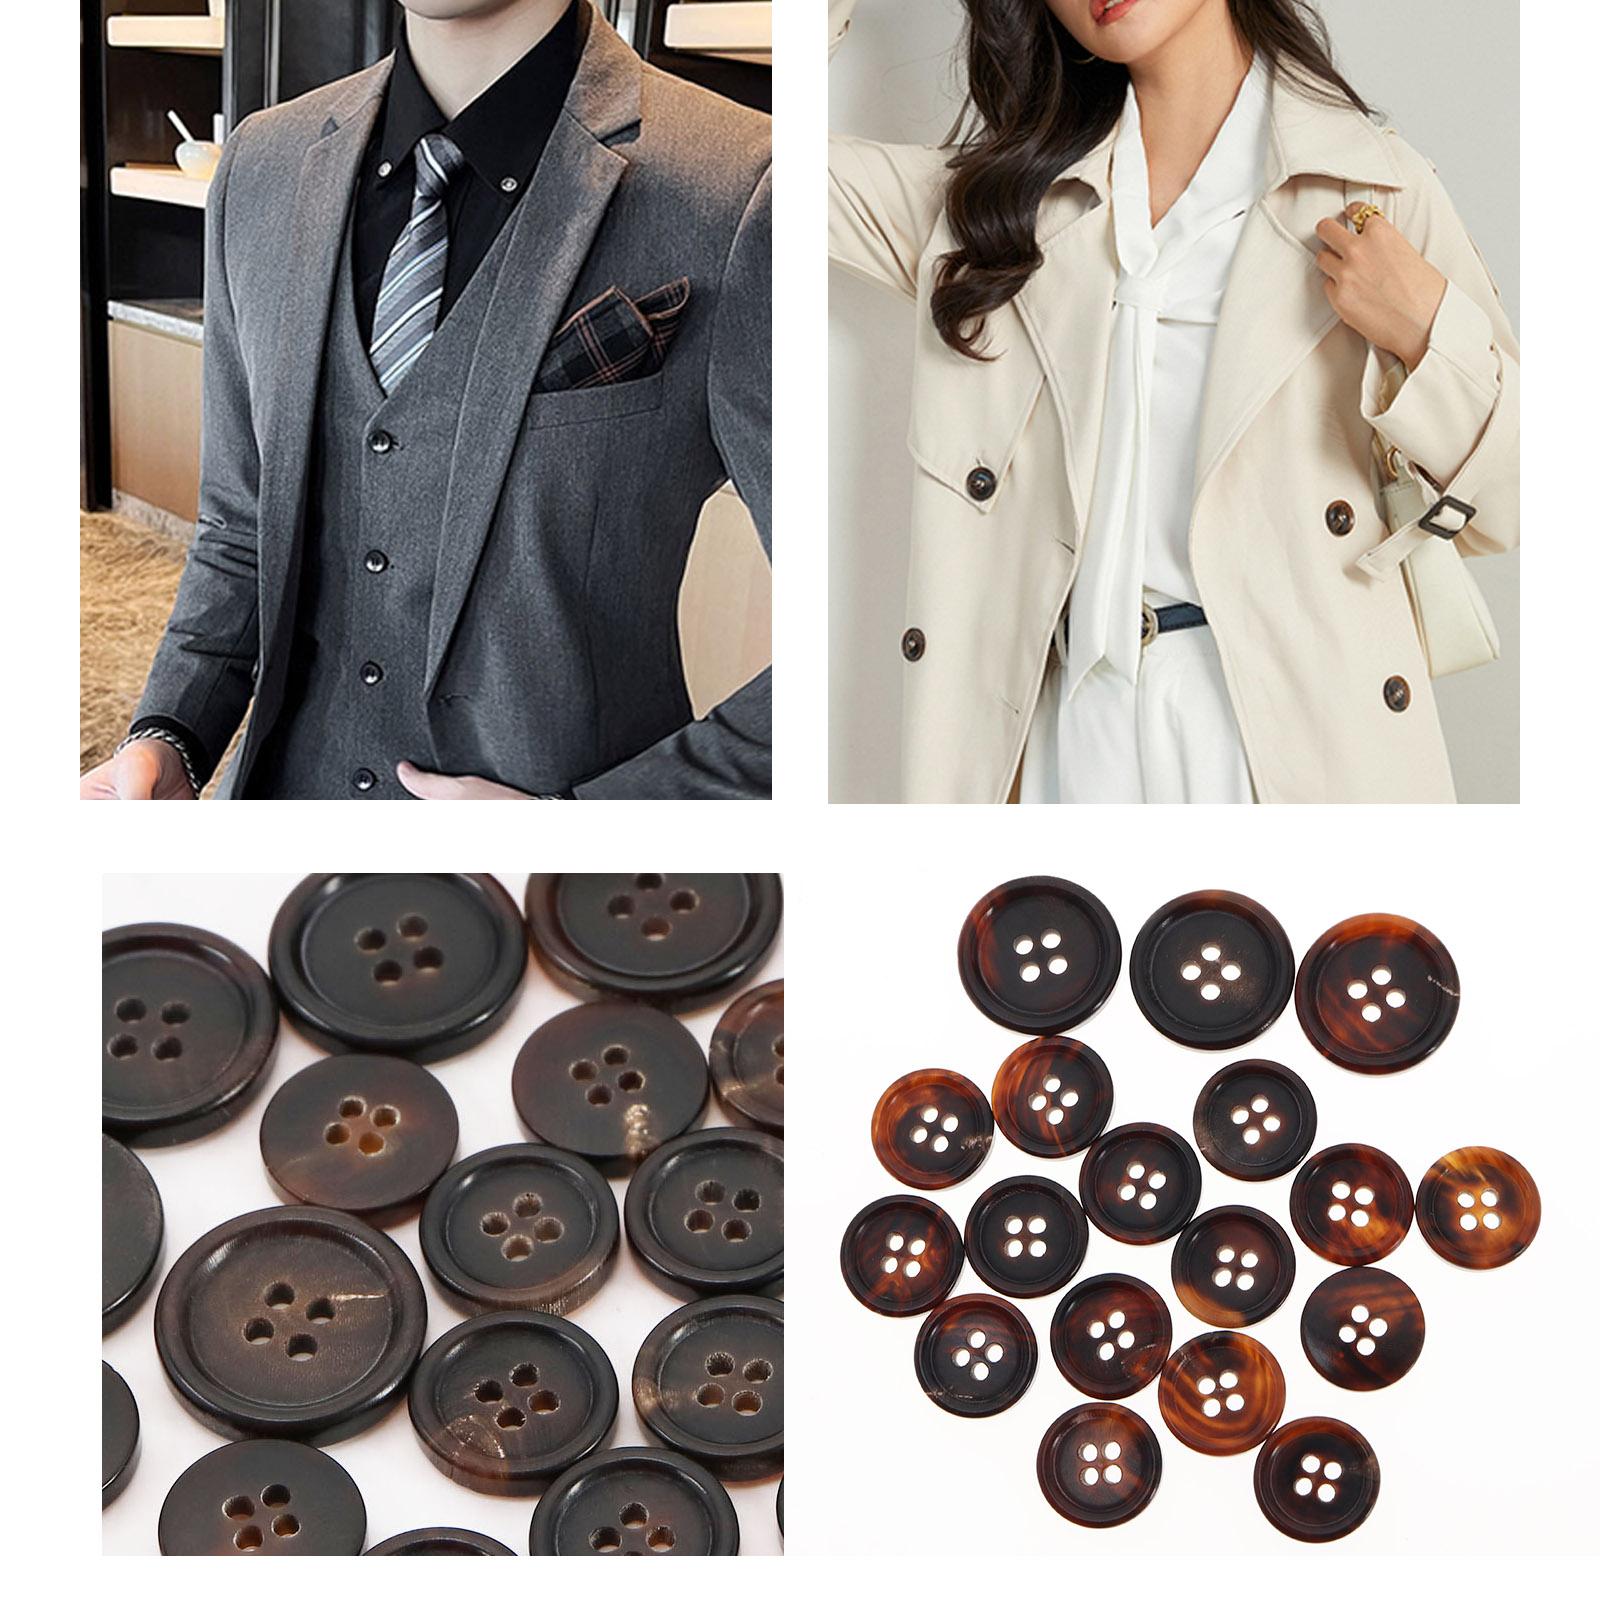 Jacket Upholstery Blazer 2pcs Round BLACK Metal Shank Sew on Buttons